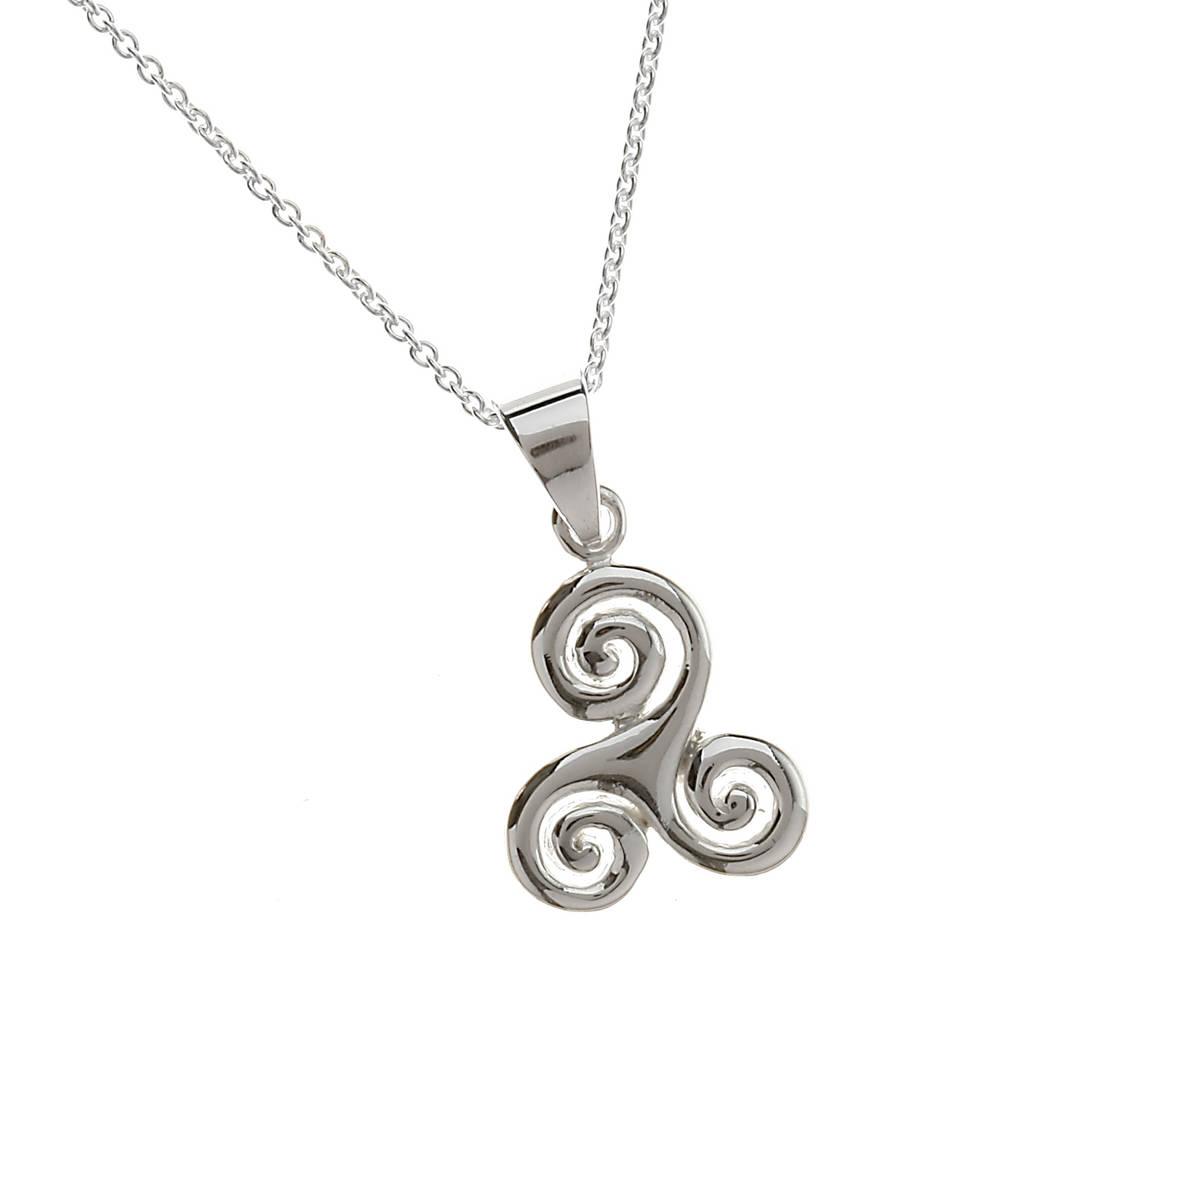 "Sil Celtic Swirl Pendant 18"" Trace"